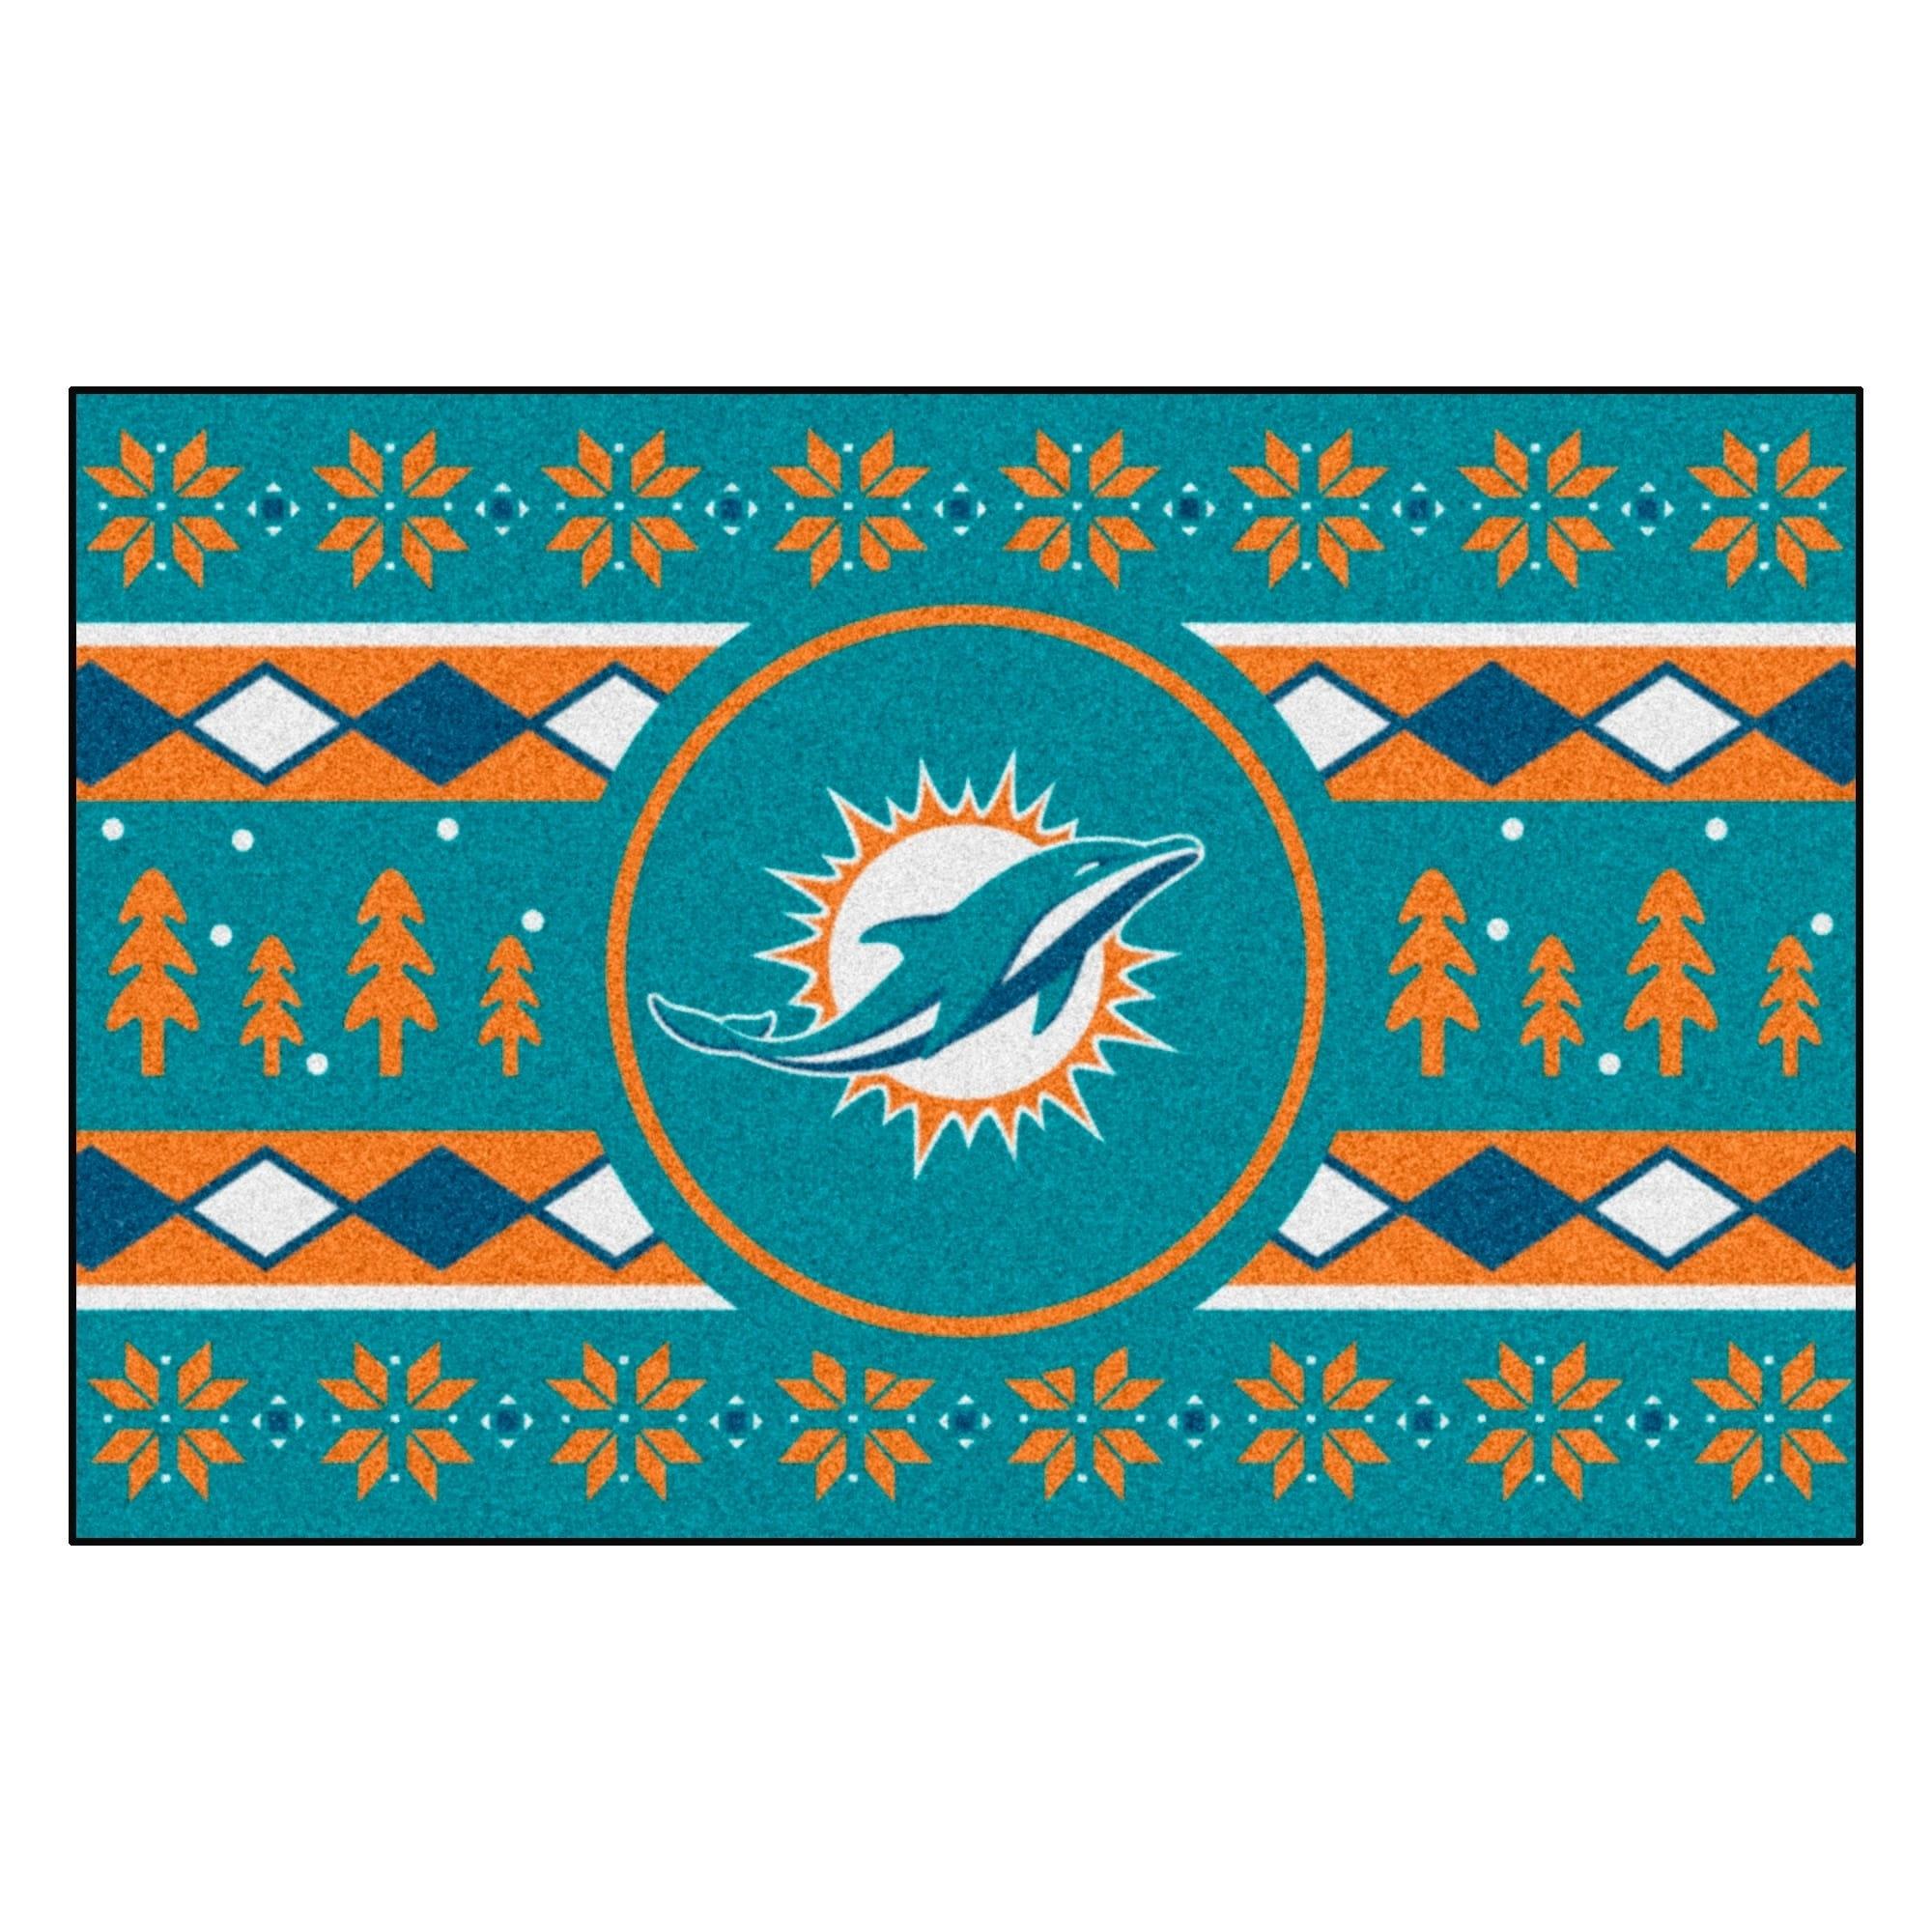 FANMATS NFL Miami Dolphins Vinyl Door Mat